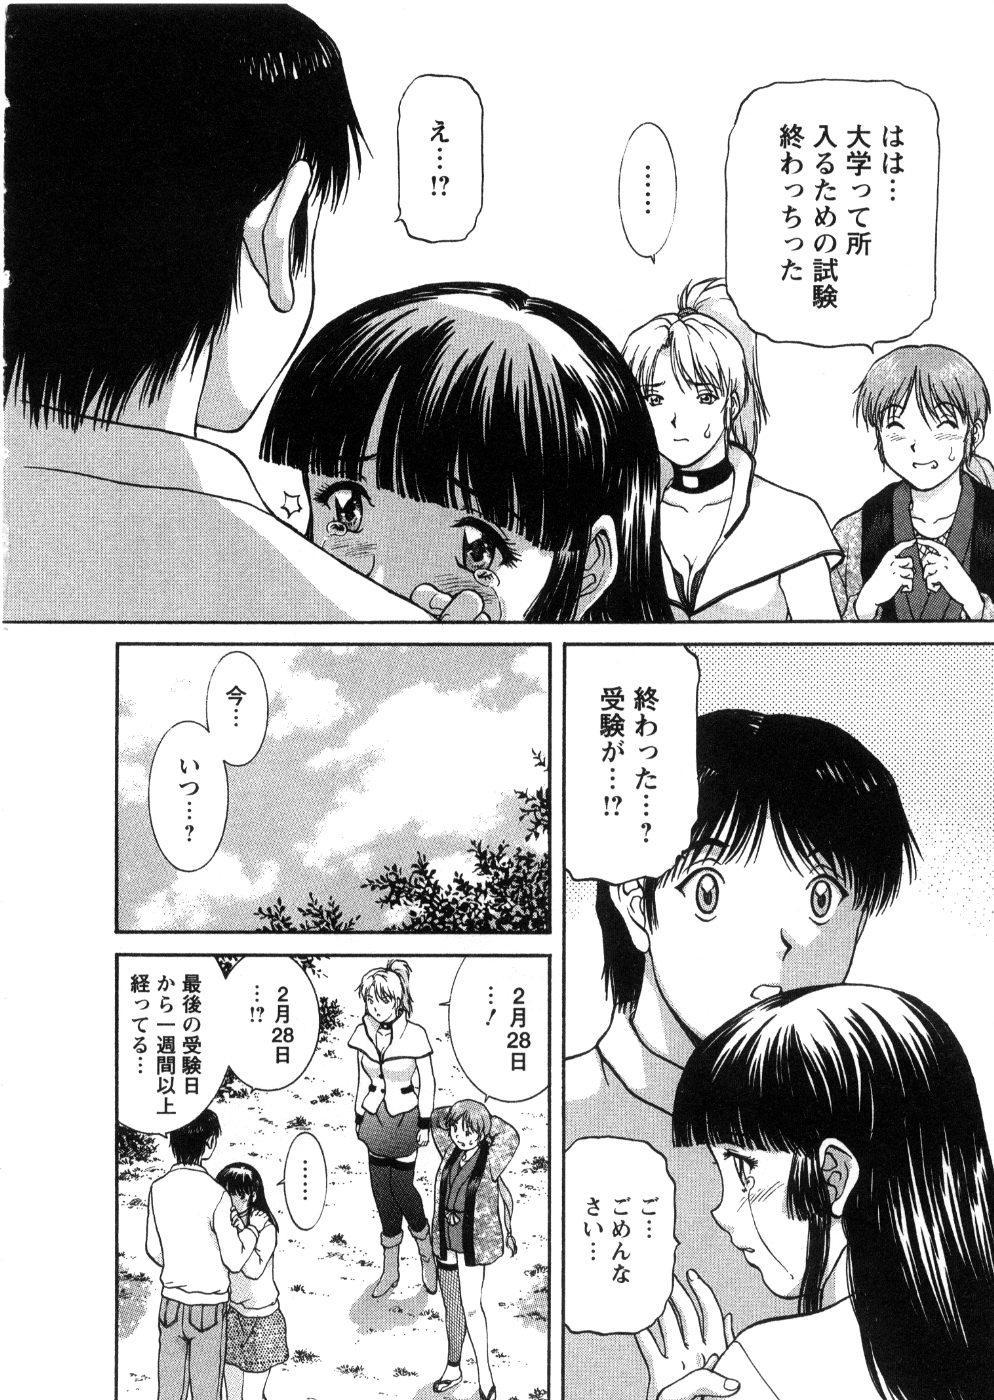 Oneechan-tachi ga Yatte Kuru 03 53